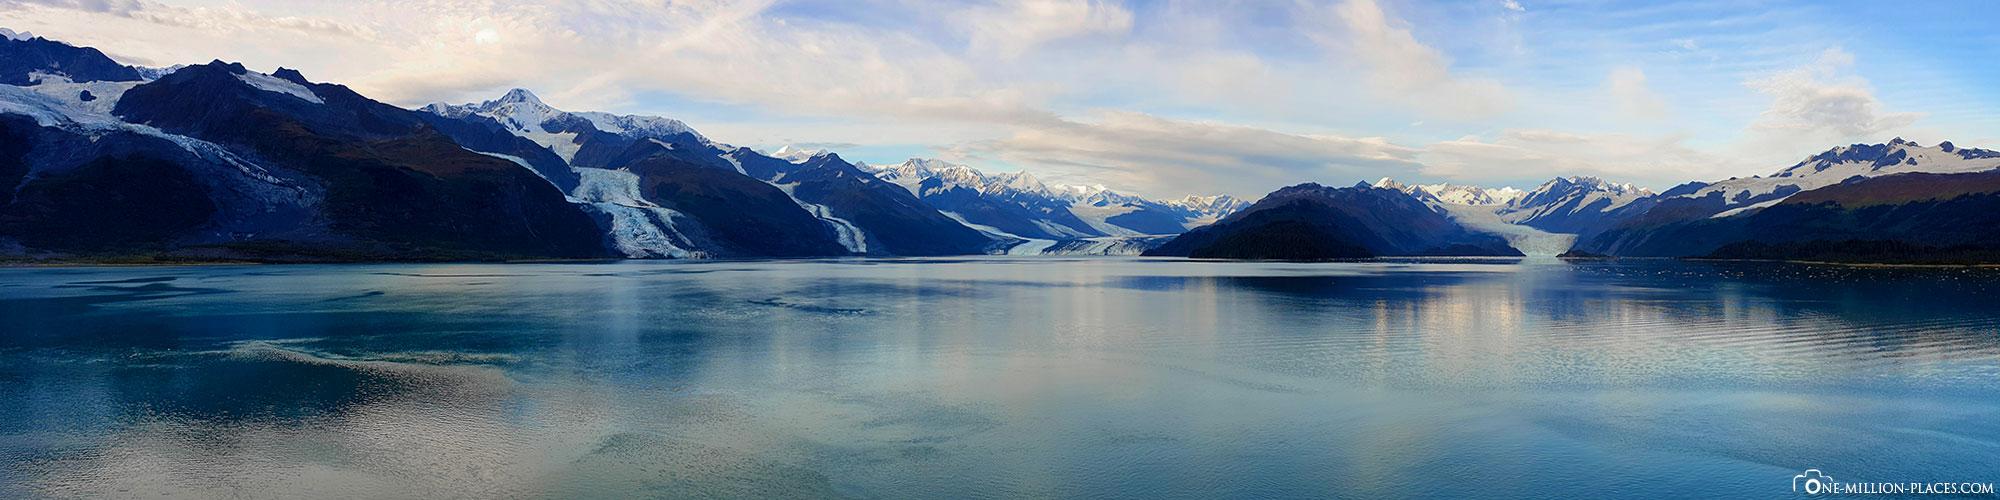 Panorama, College Fjord, Princess Cruises, Kreuzfahrt, Alaska, USA, Reisebericht, Scenic Cruise